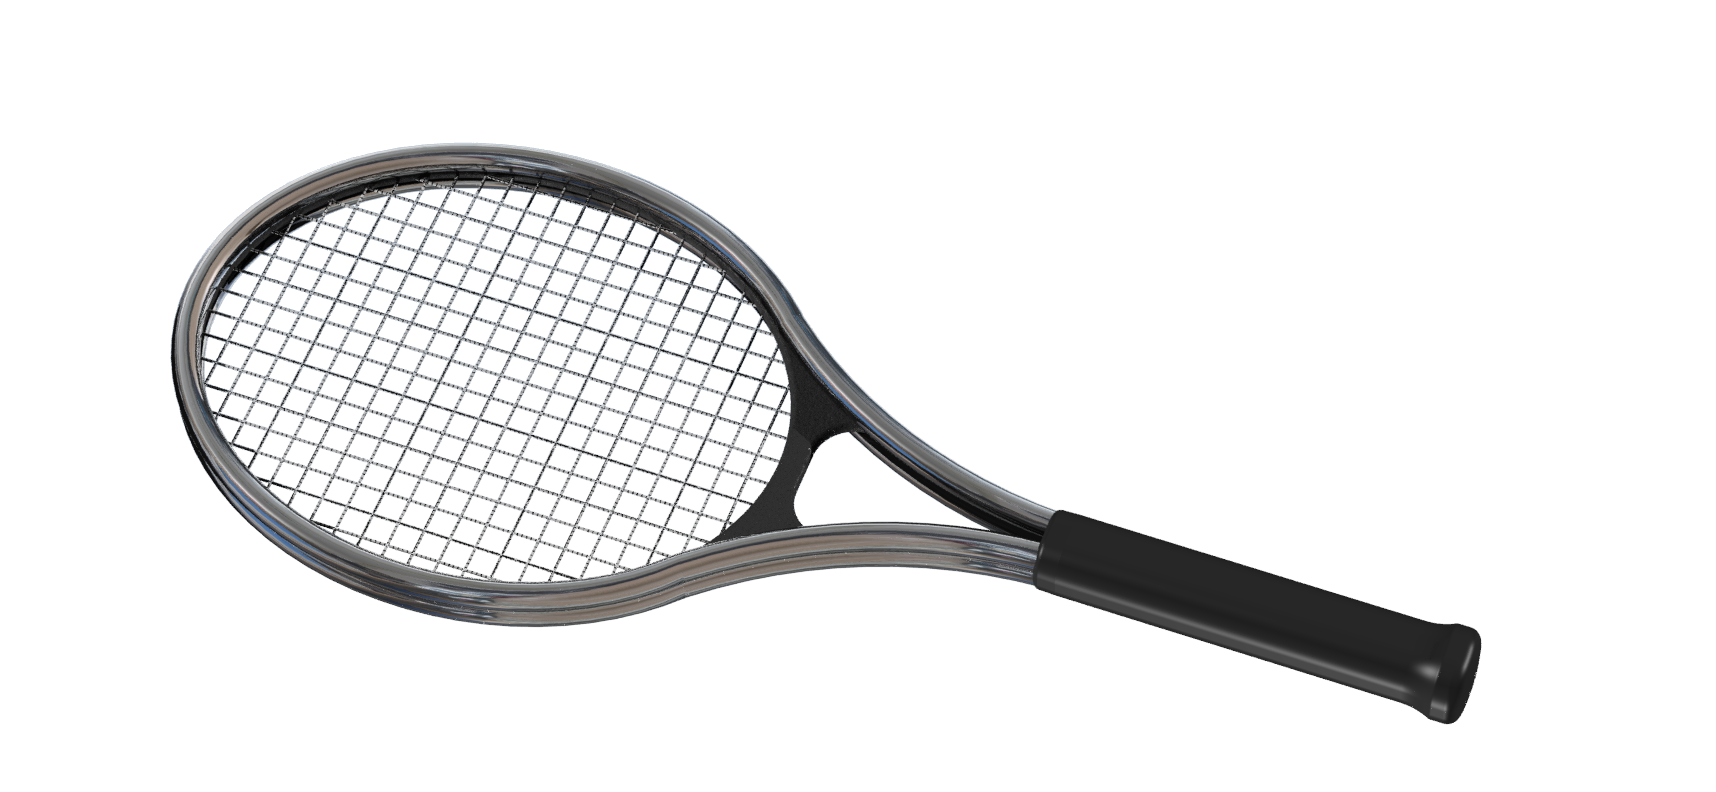 Rocket clipart tennis #9